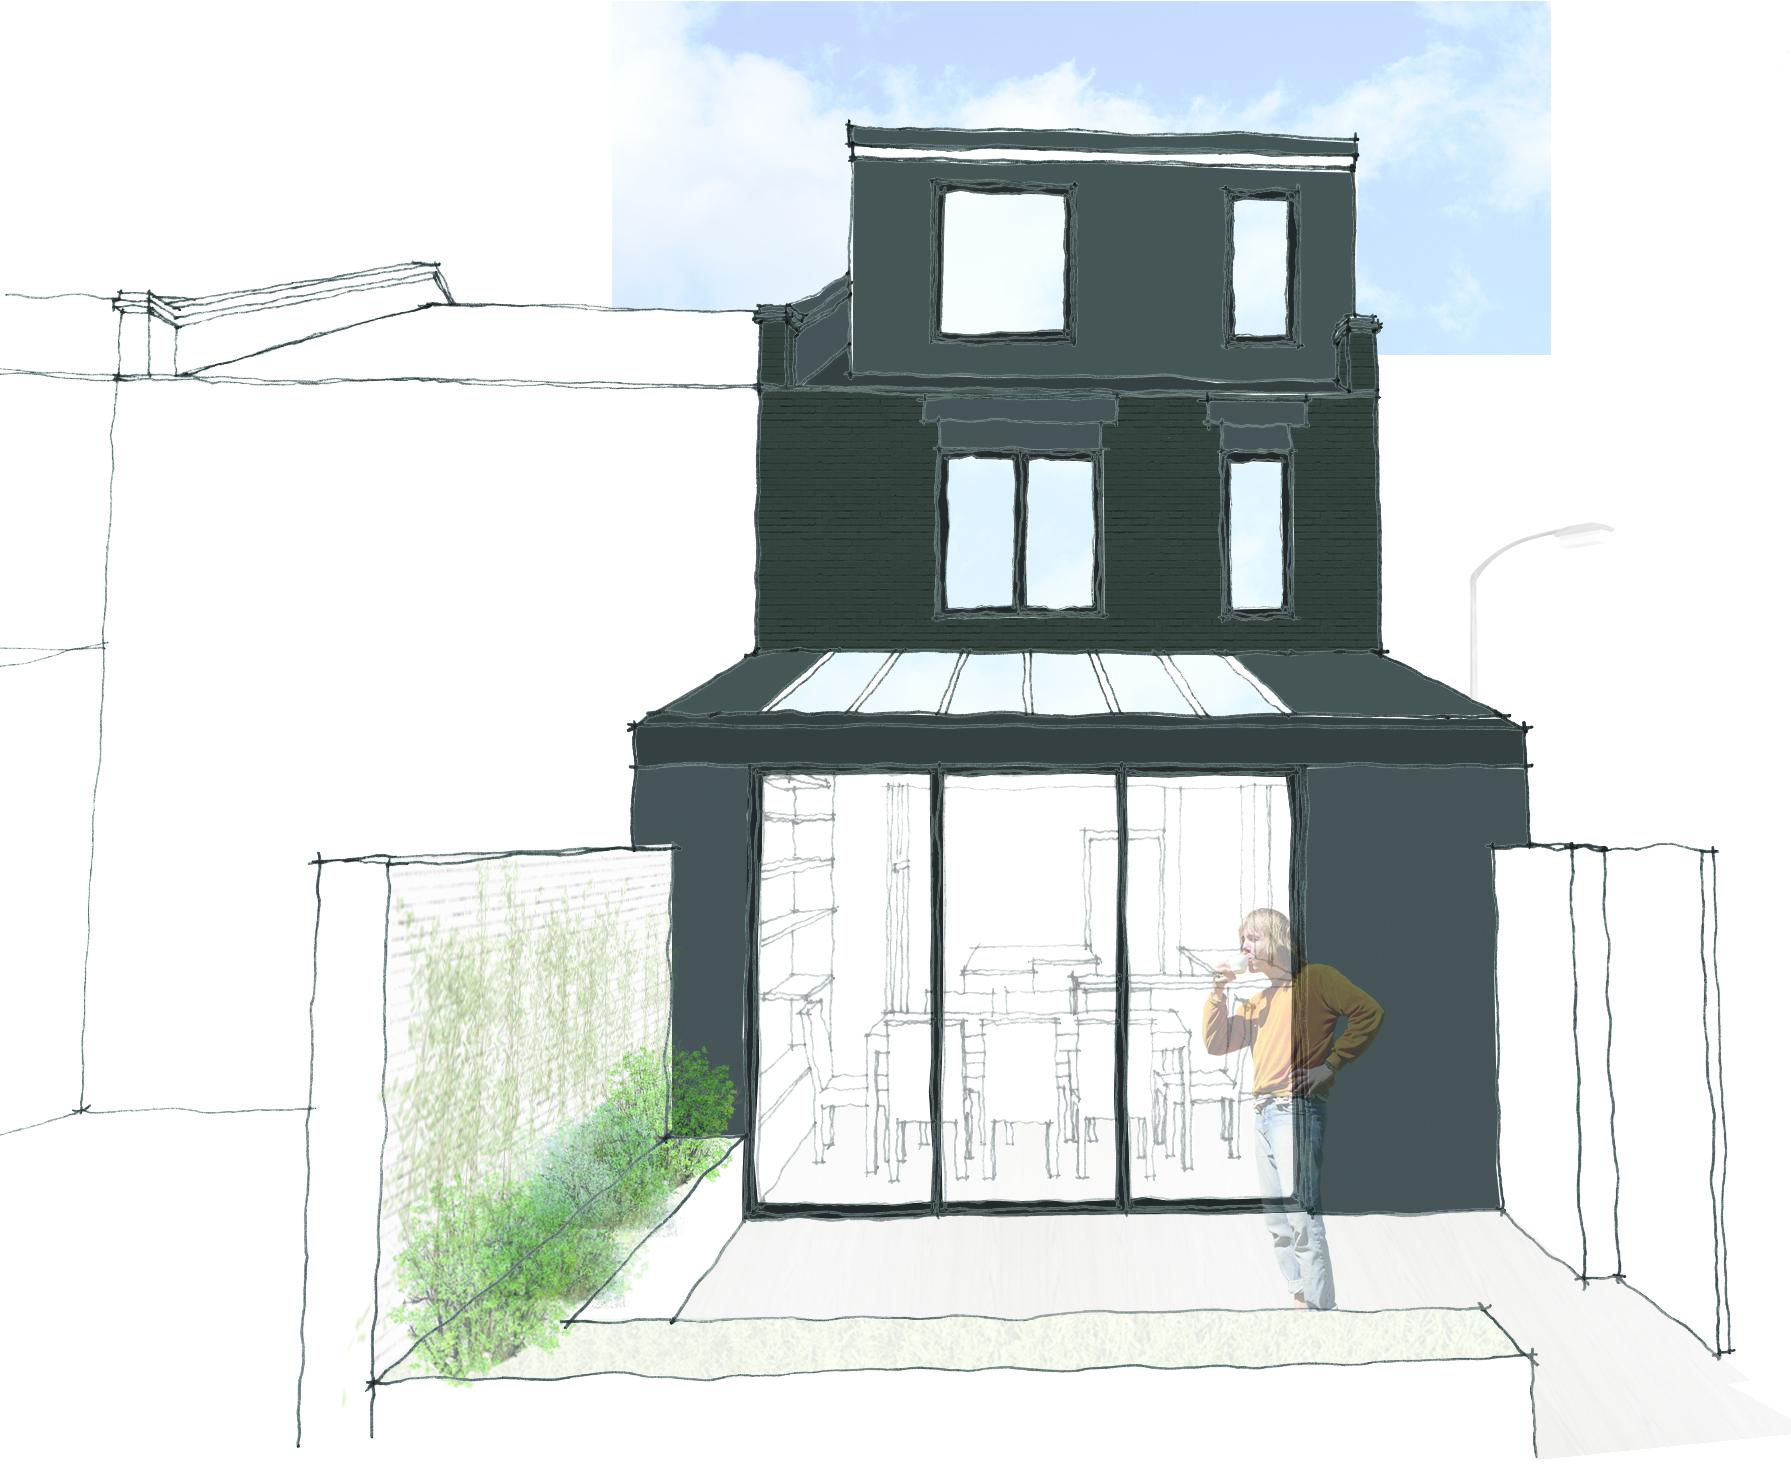 Strathville_Road-Sketch-160209-002.jpg